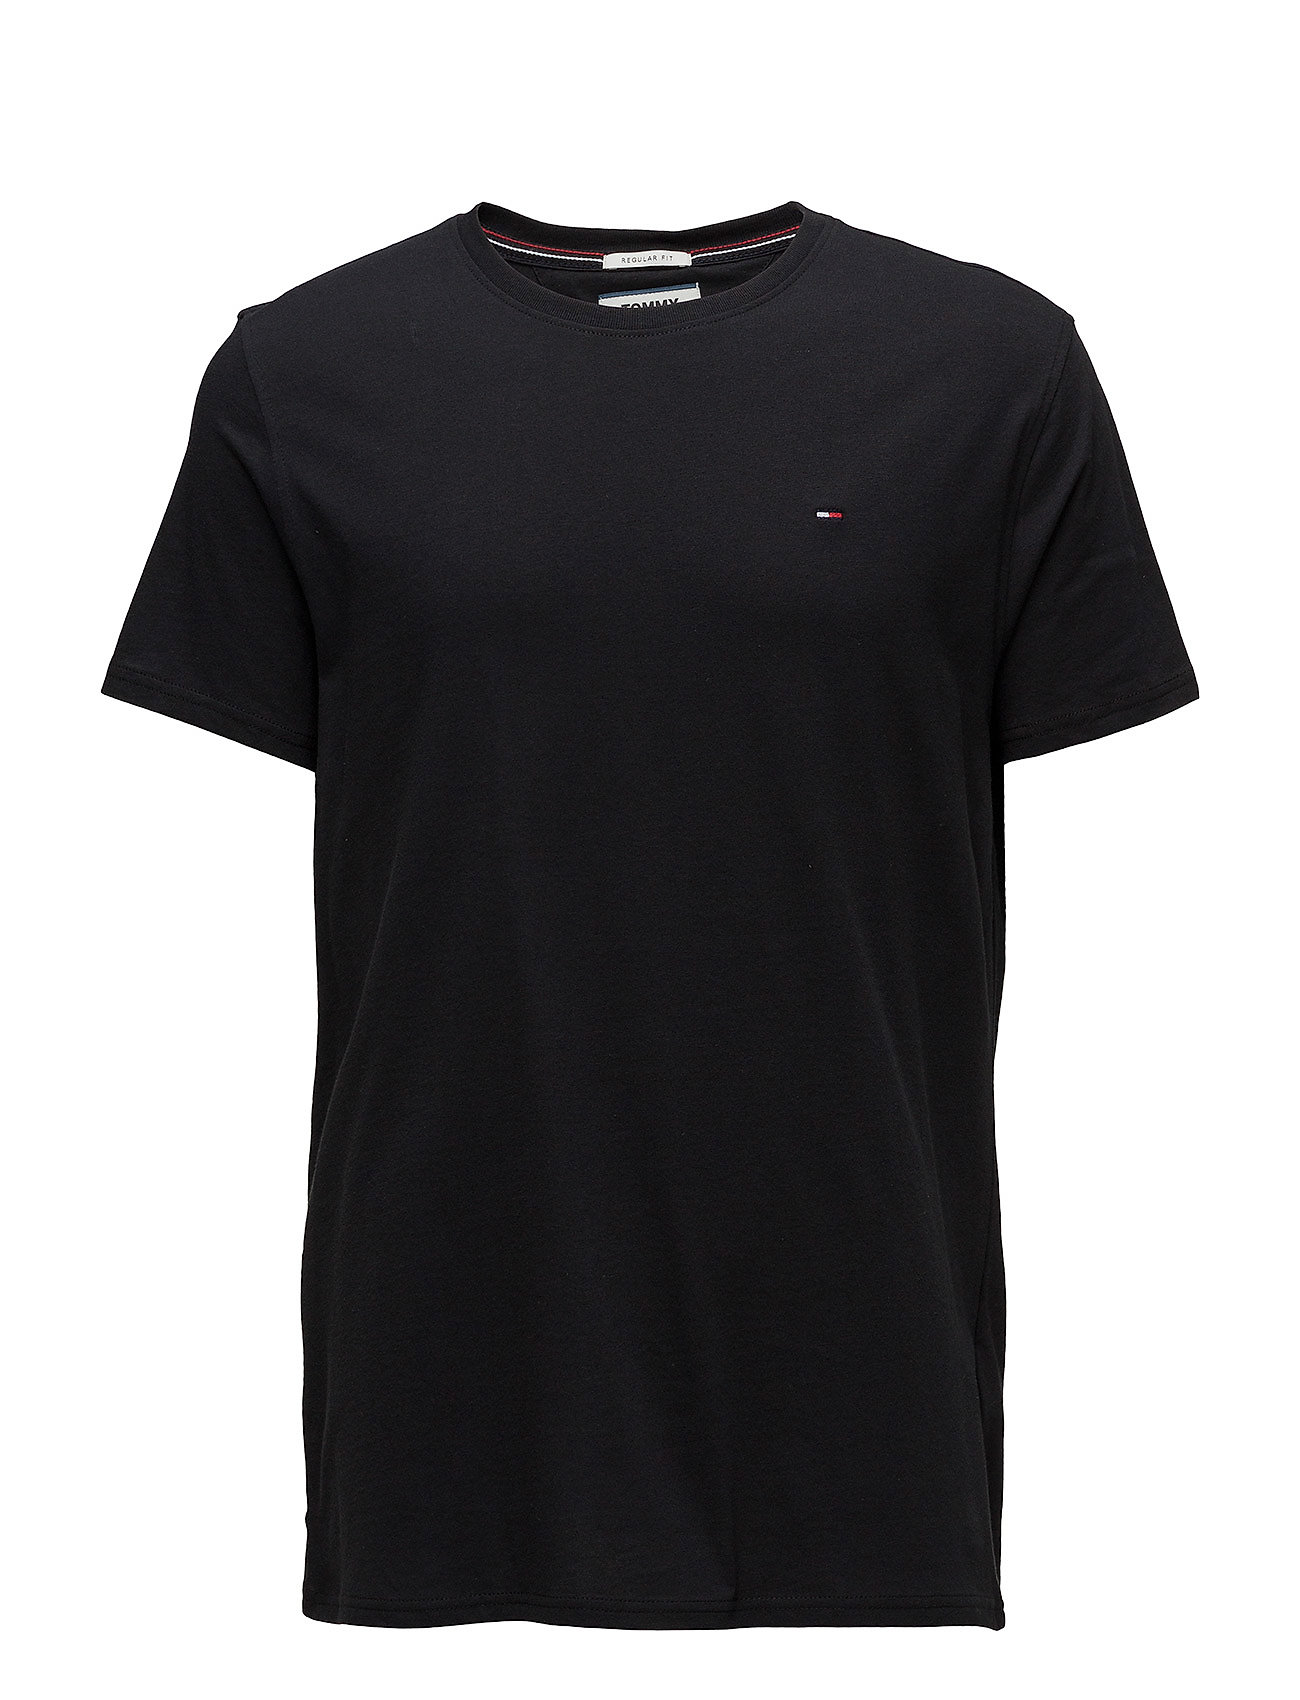 Tommy Jeans - TJM ORIGINAL JERSEY TEE - basic t-shirts - tommy black - 0